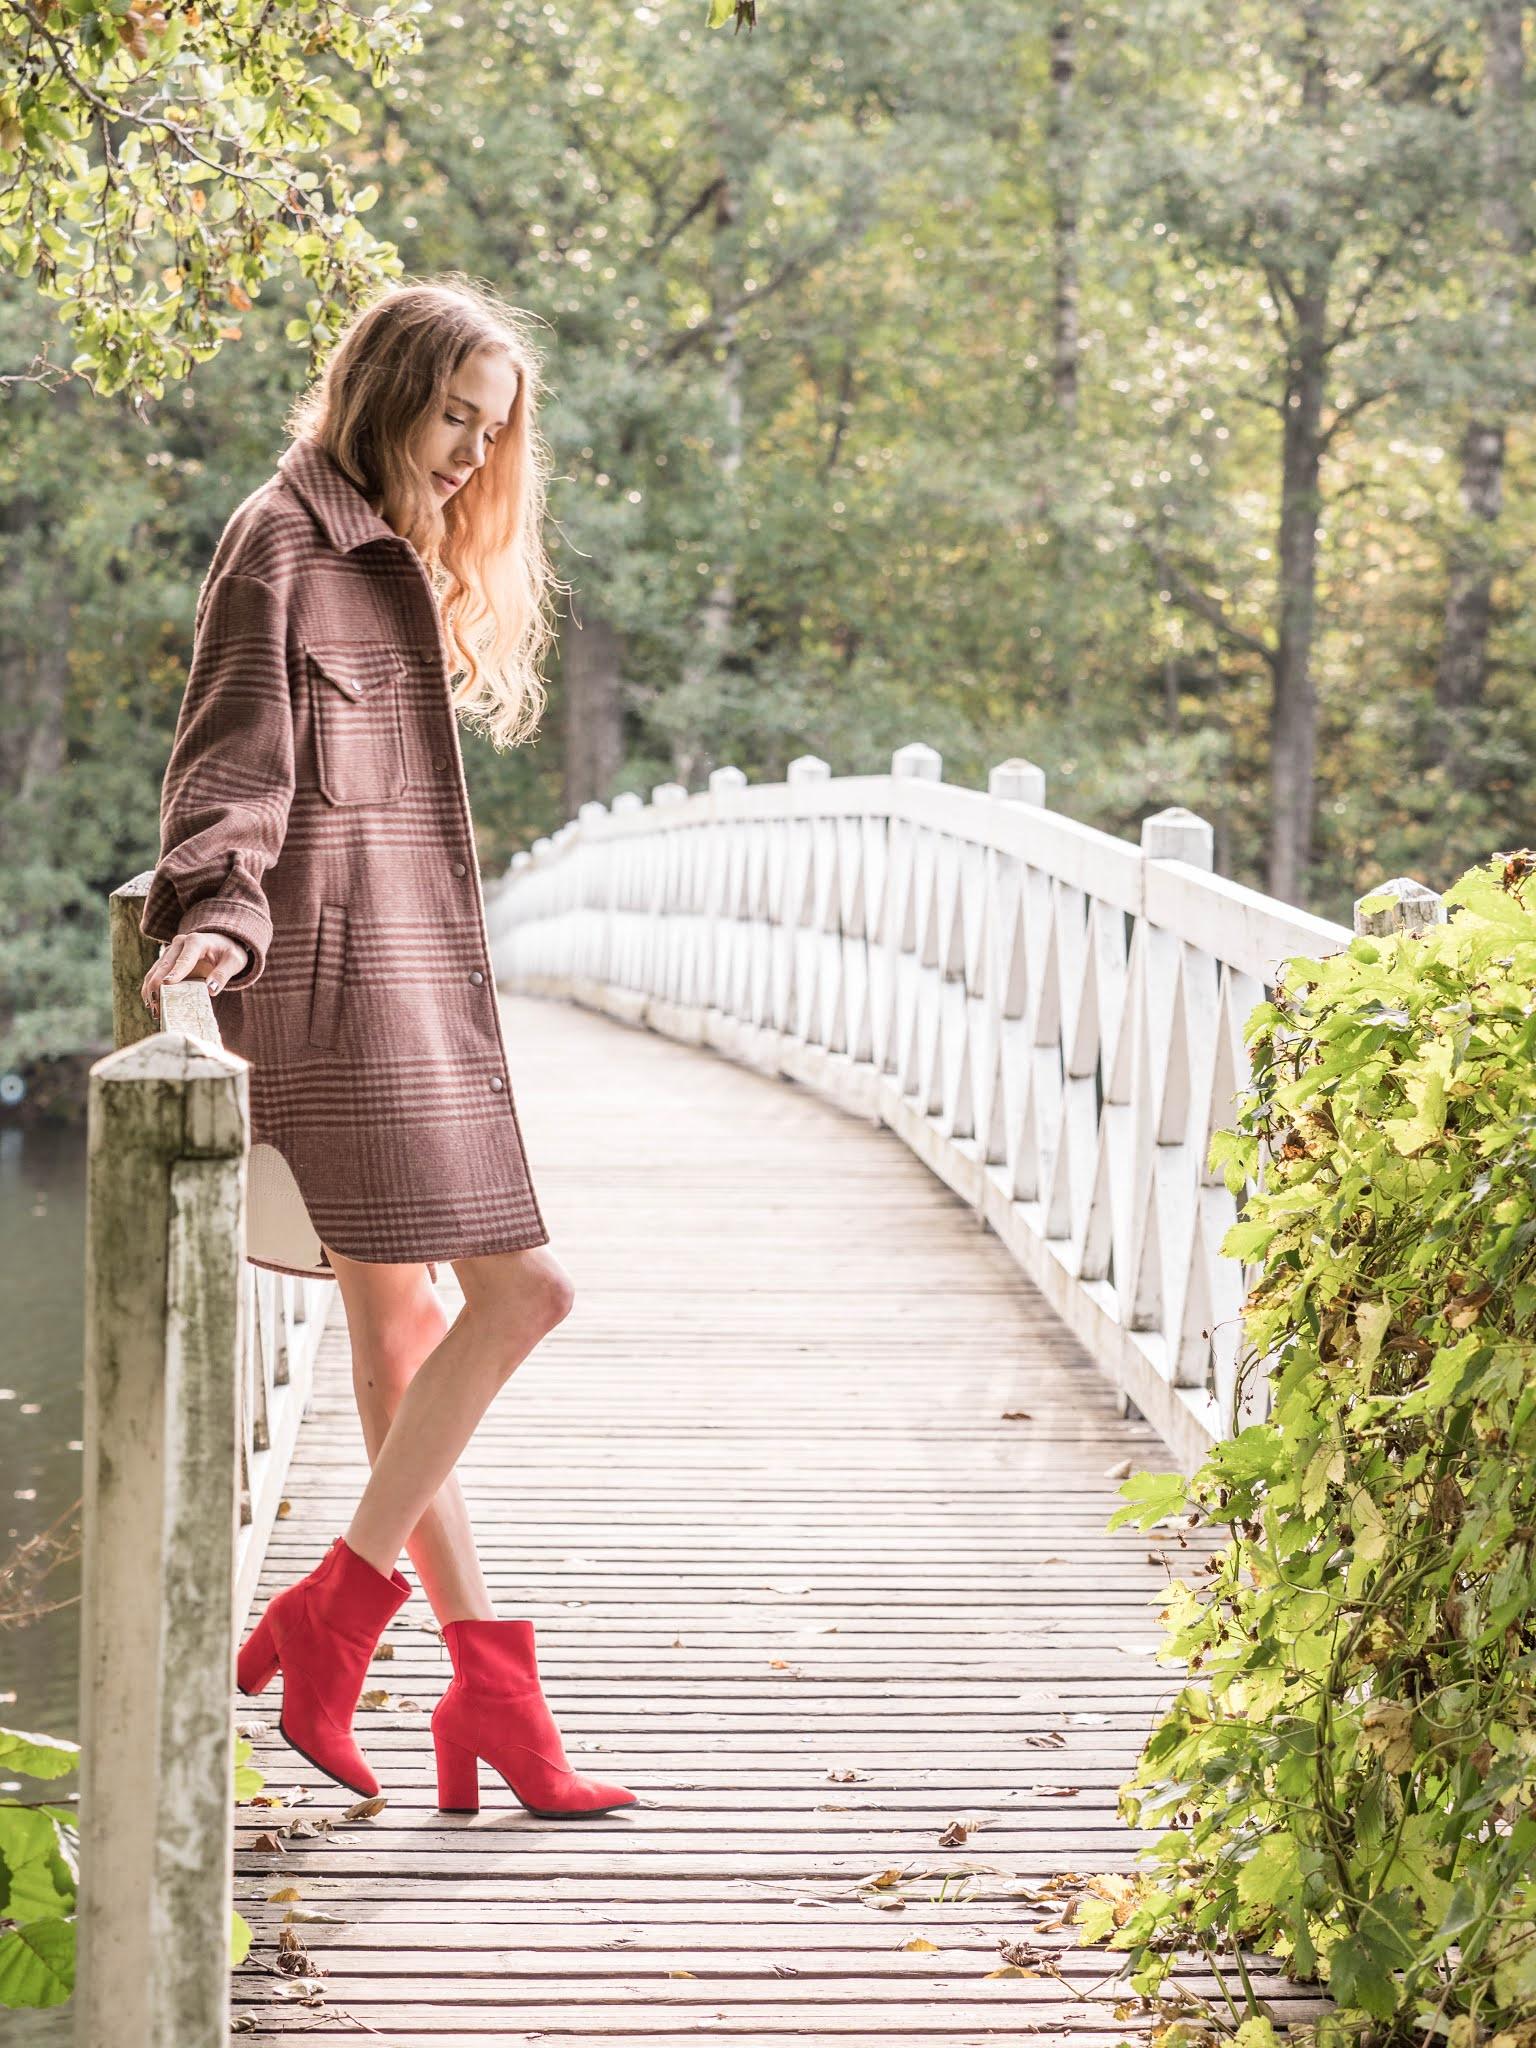 Syyasasu punaisten nilkkureiden kanssa // Autumn outfit with red ankle boots